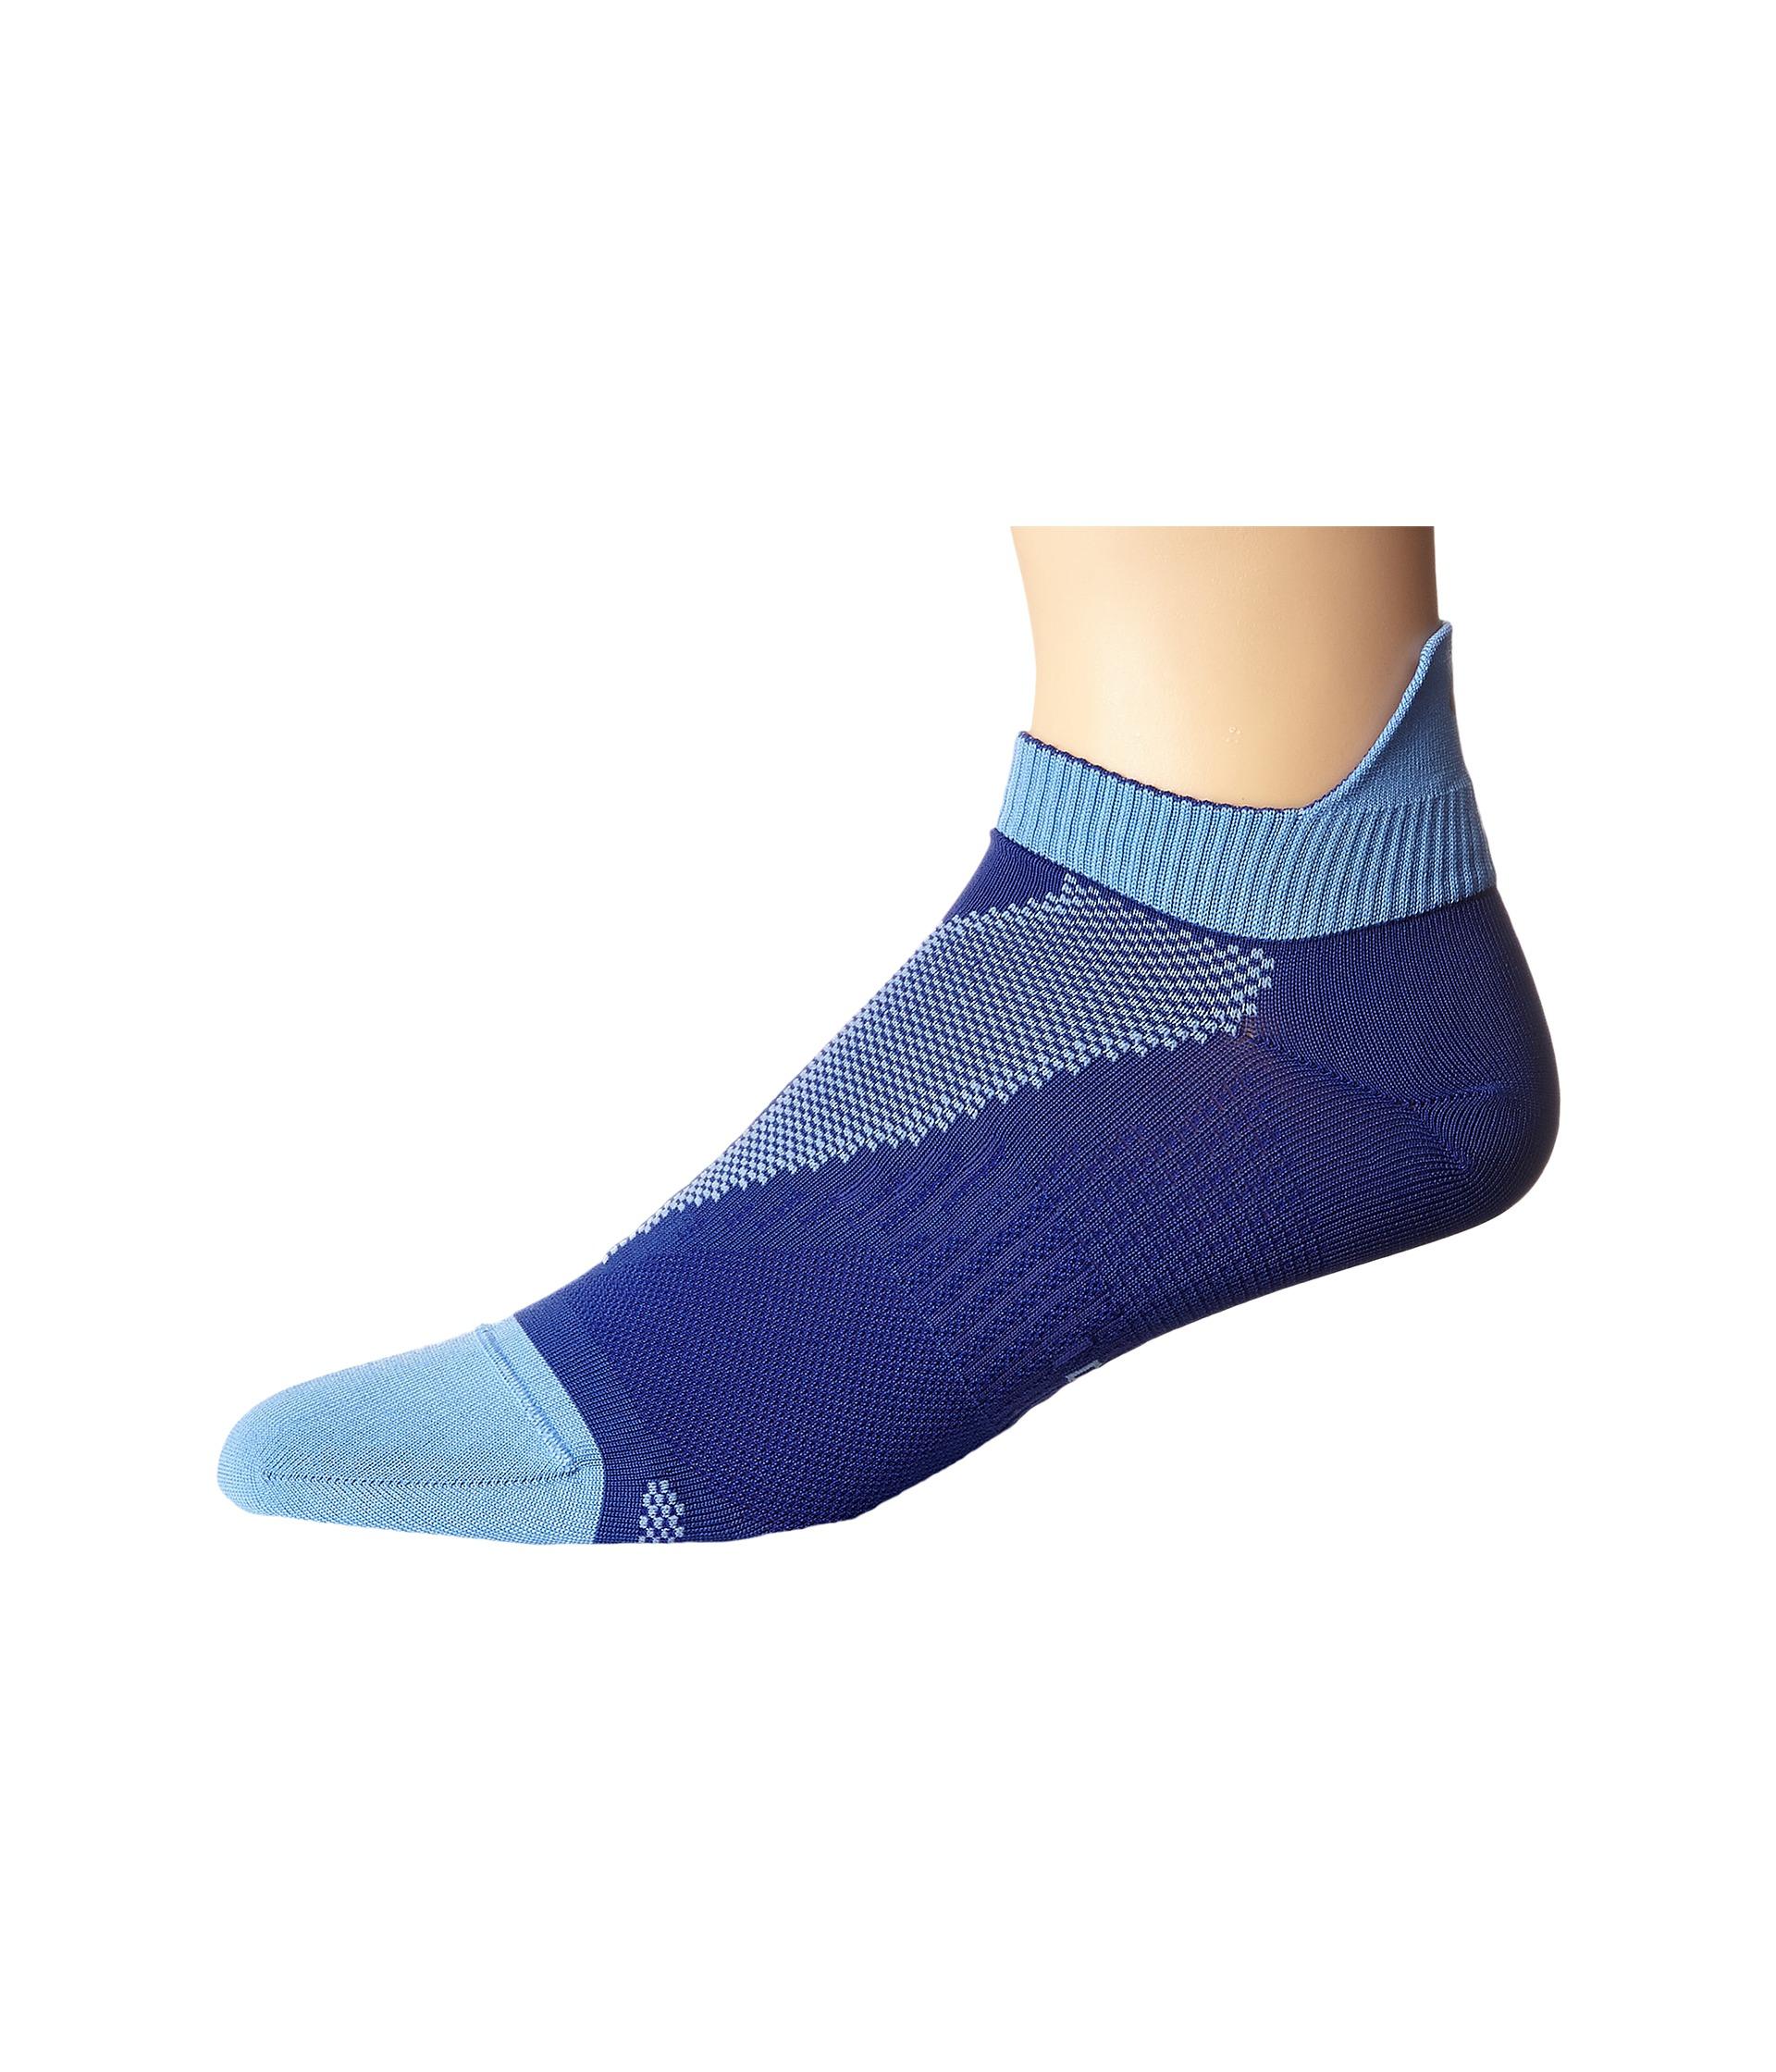 Nike Elite Lightweight Quarter Deep Night/Chalk Blue Running Socks